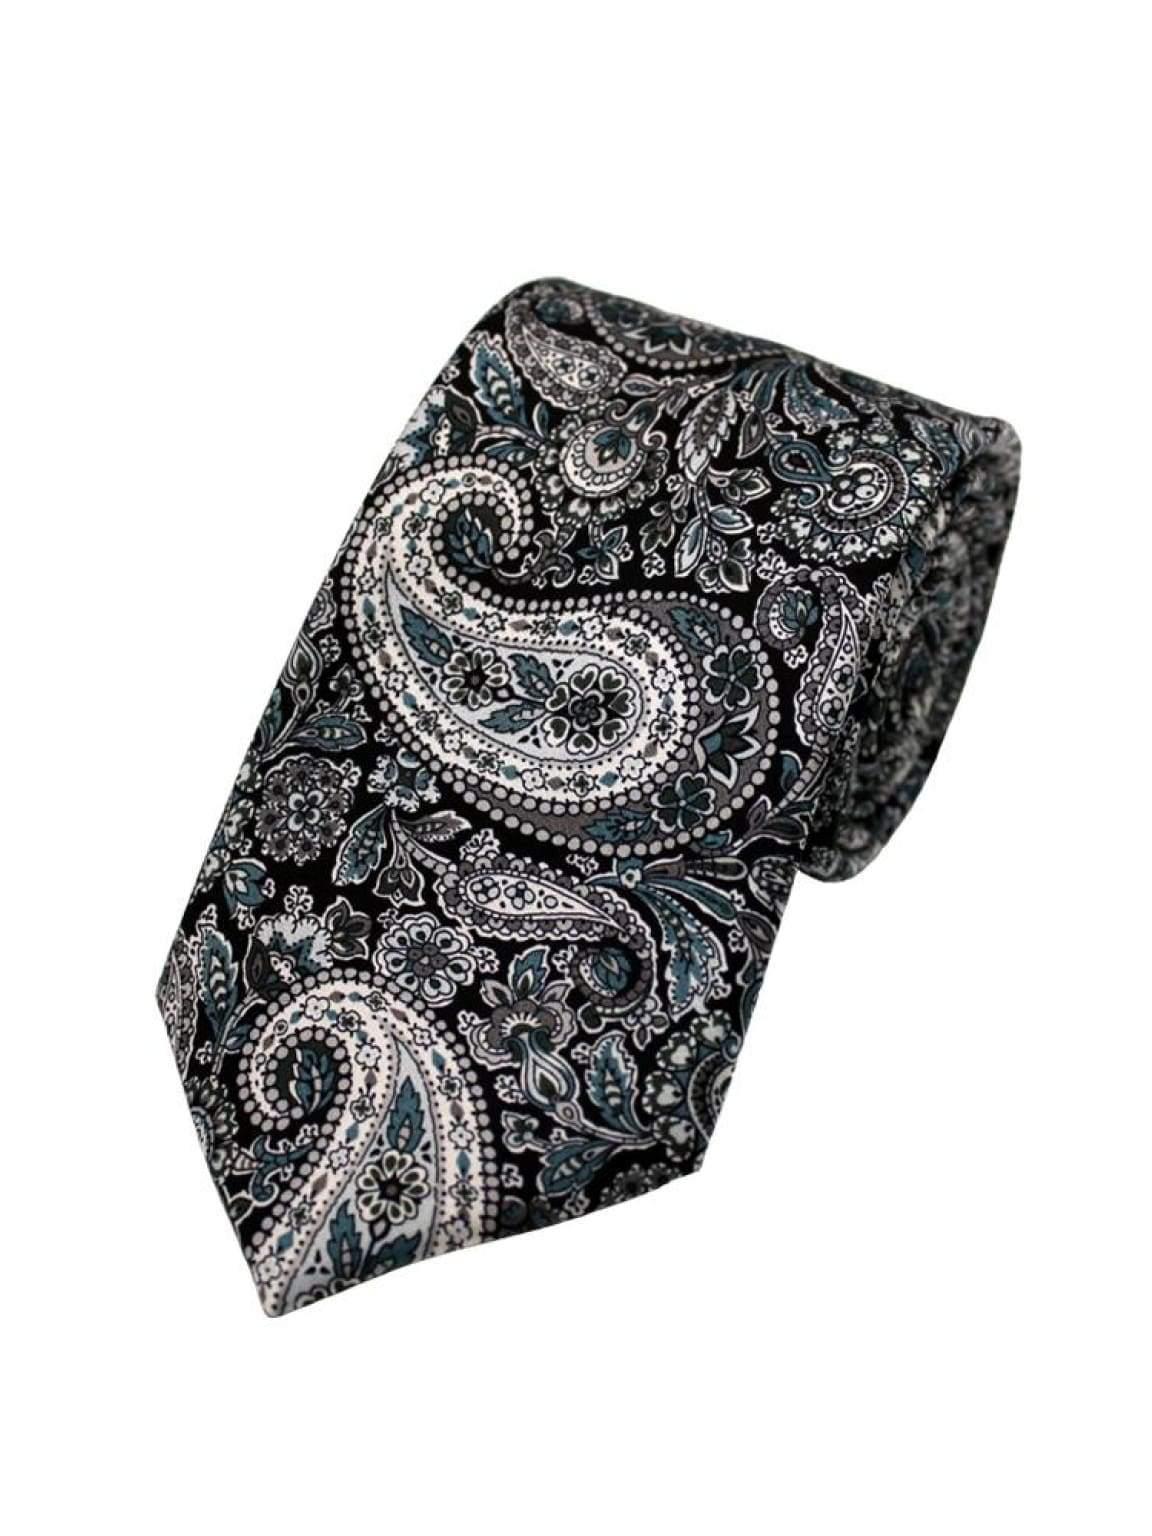 Liberty Fabric Lee Manor Black Pure Silk Tie - Accessories